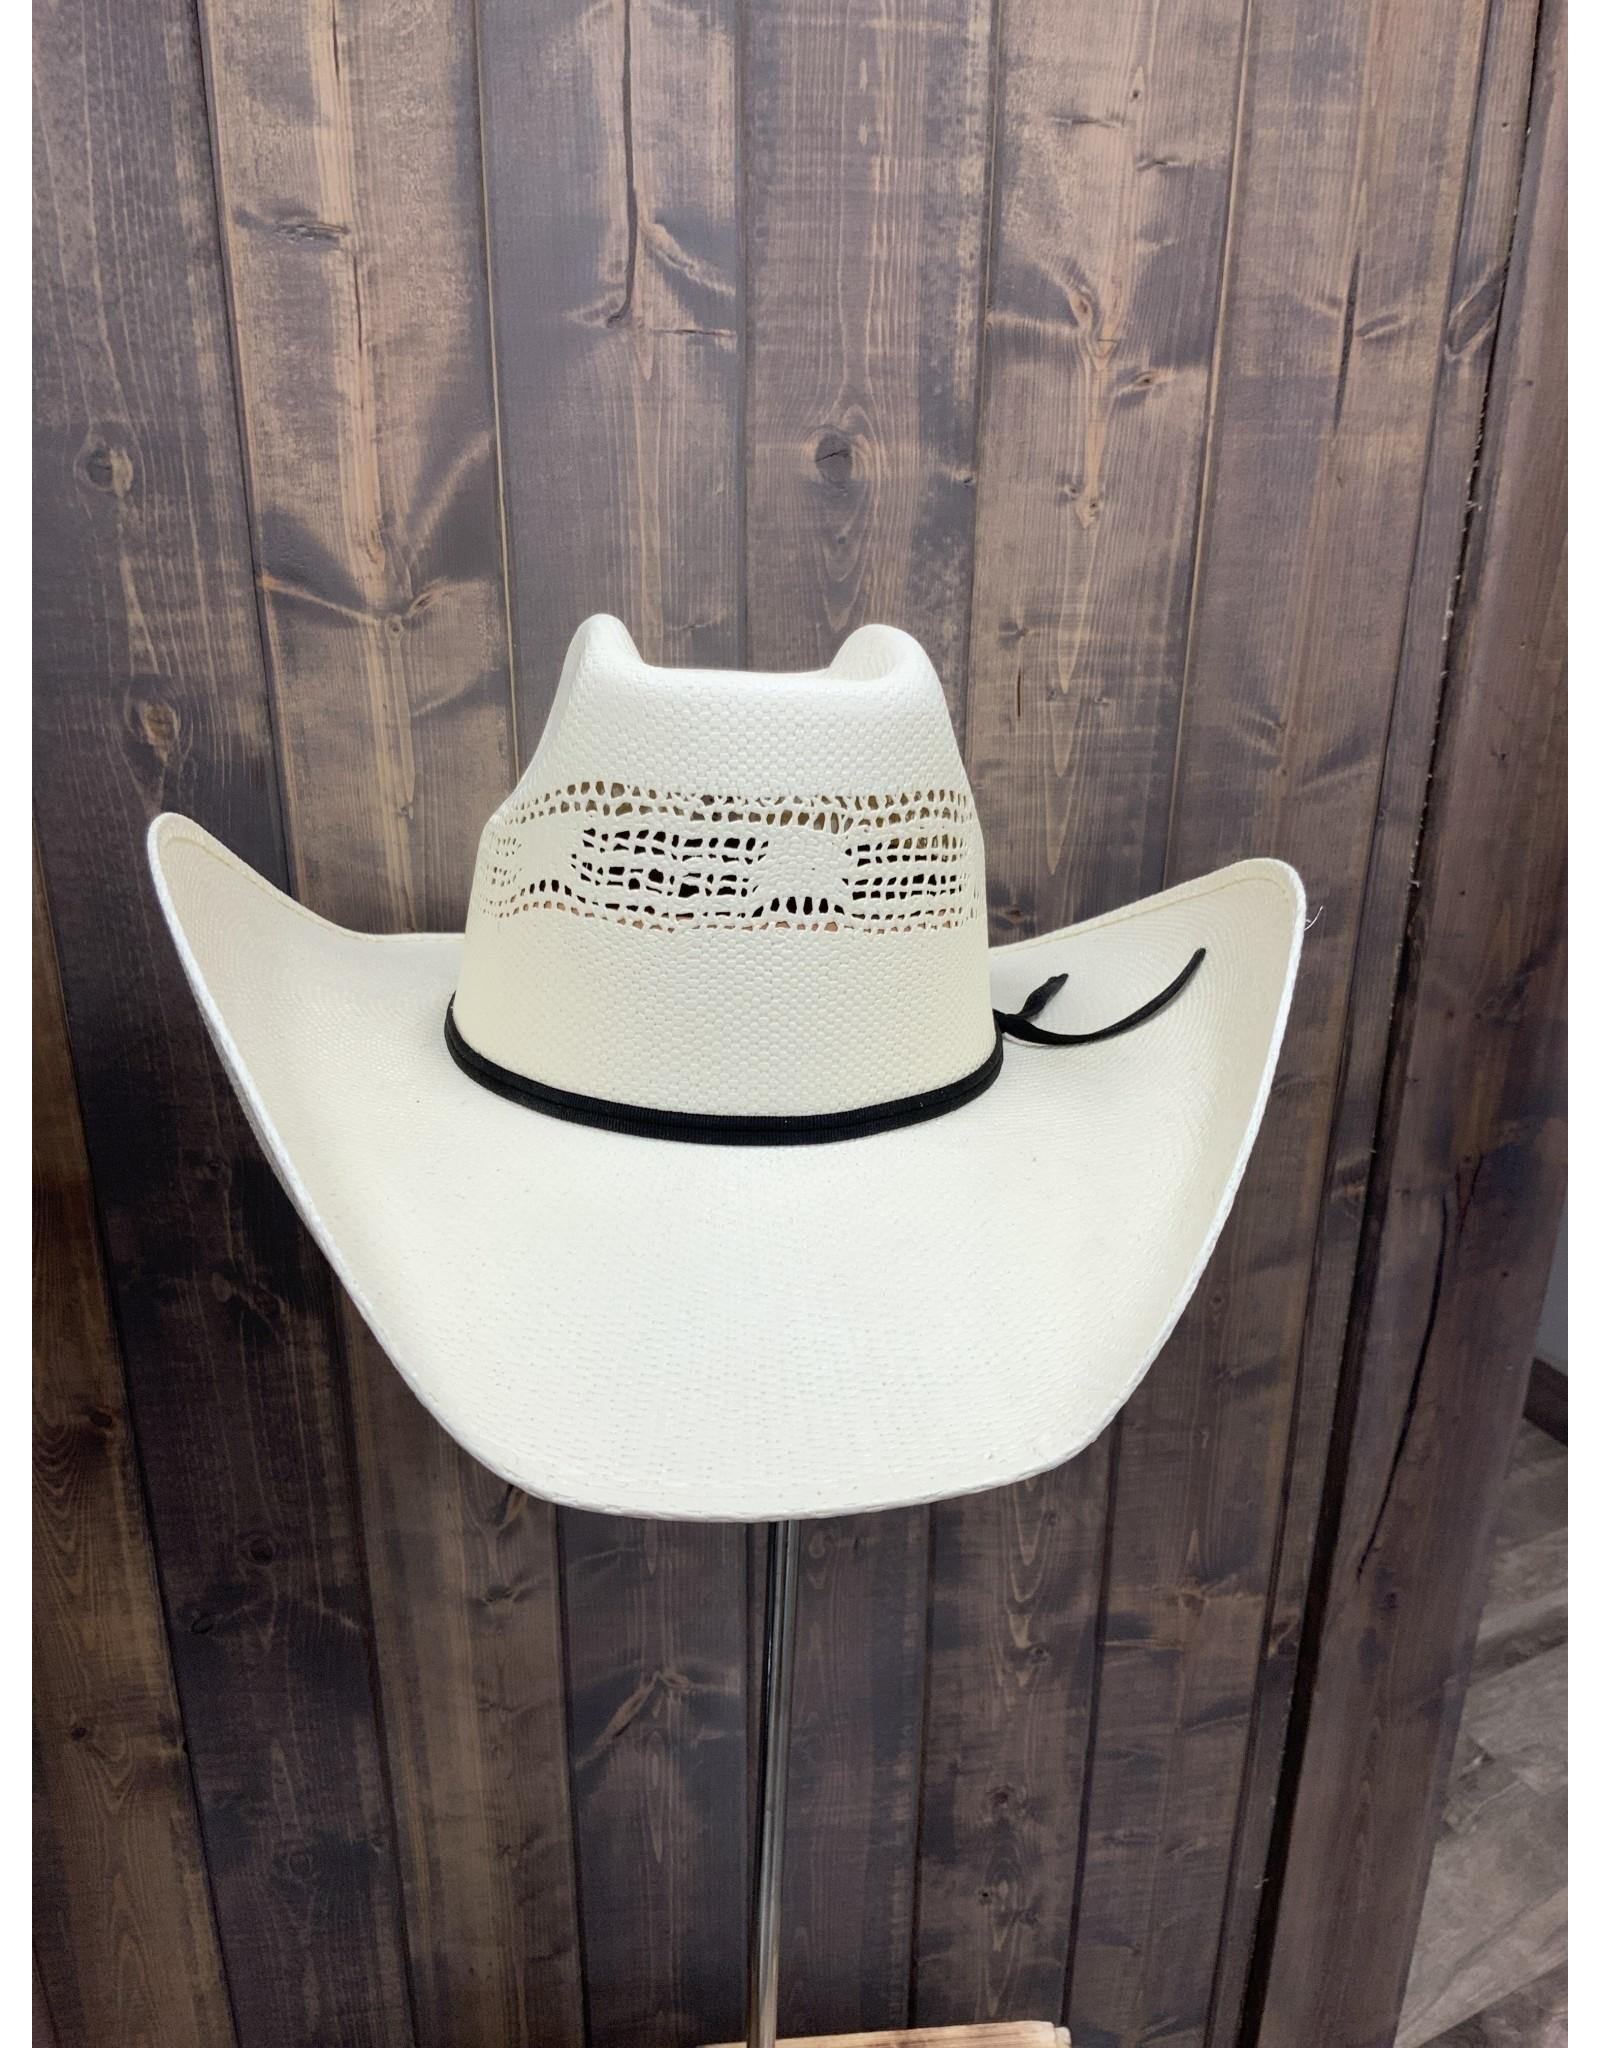 8 SEC BANGORA STRAW COWBOY HAT